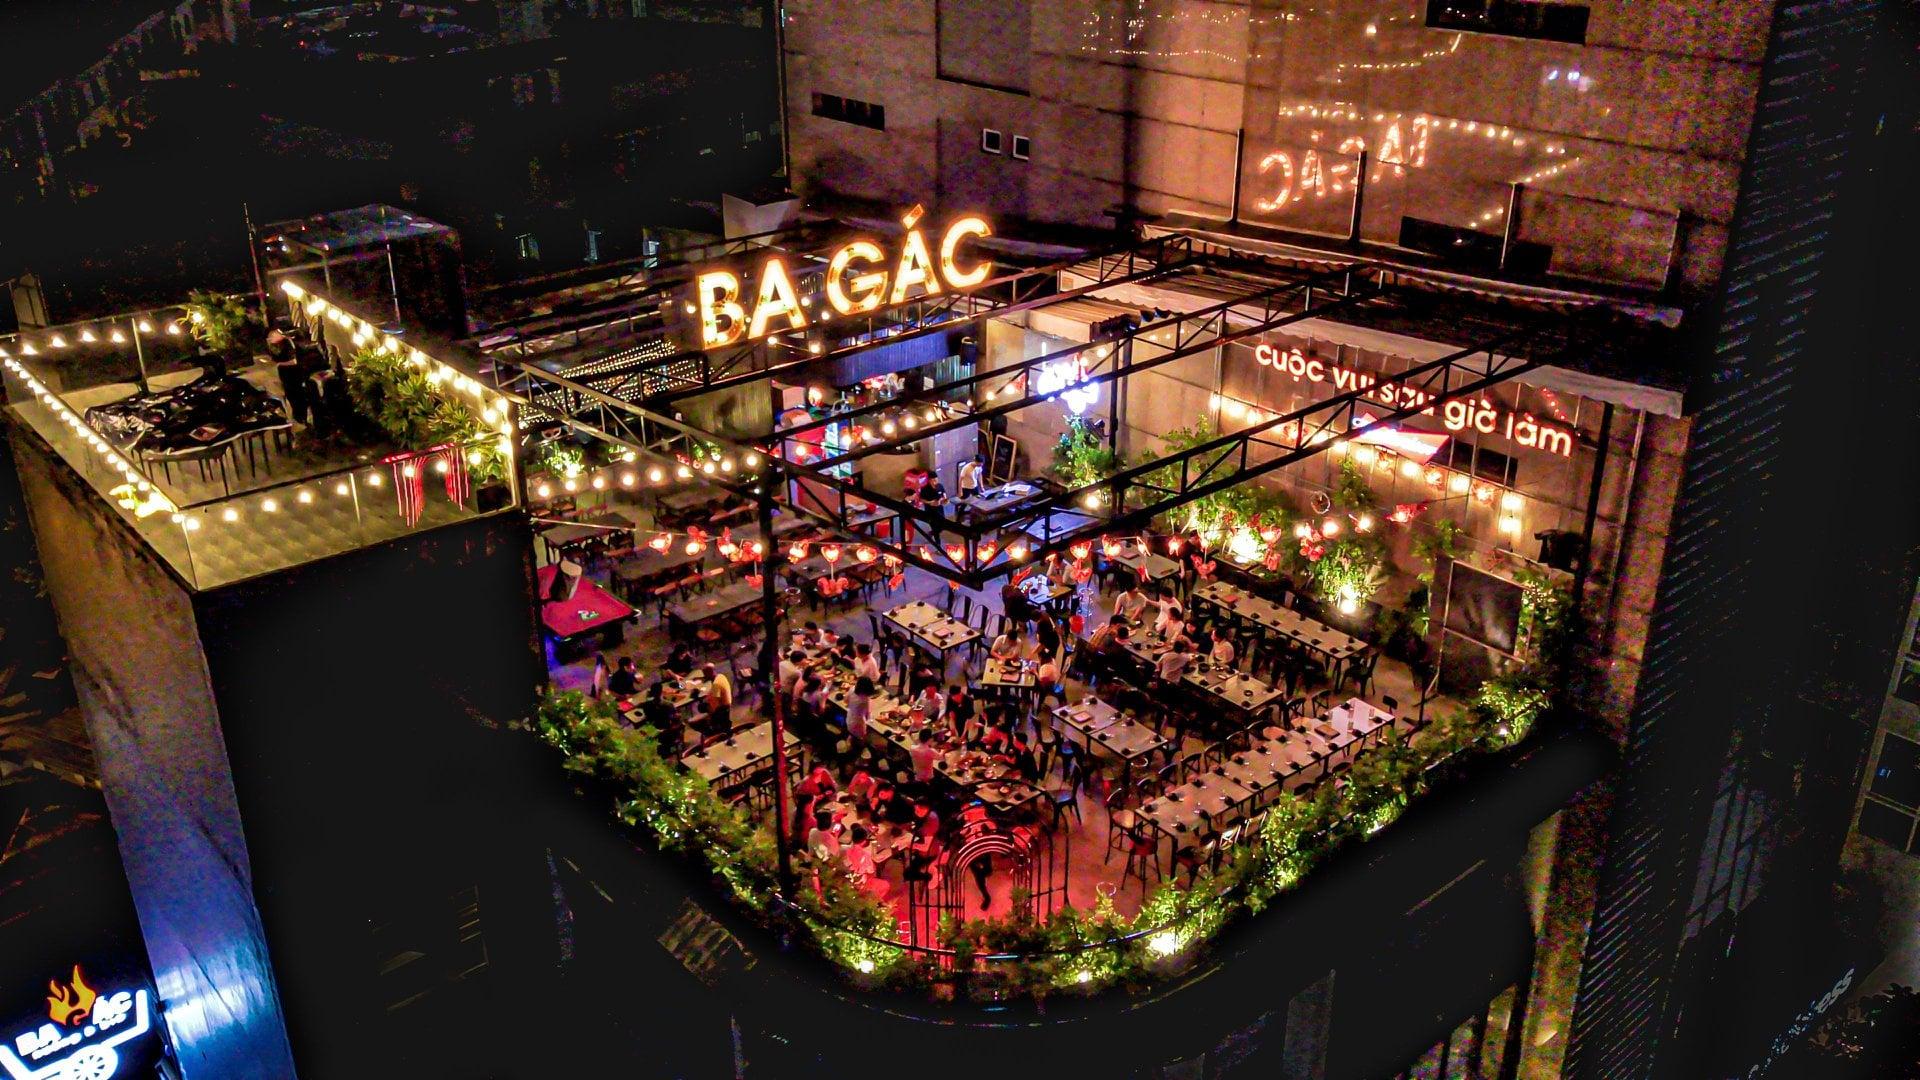 Top 10 quán beer - garden mở xuyên tết 2021 ở TPHCM